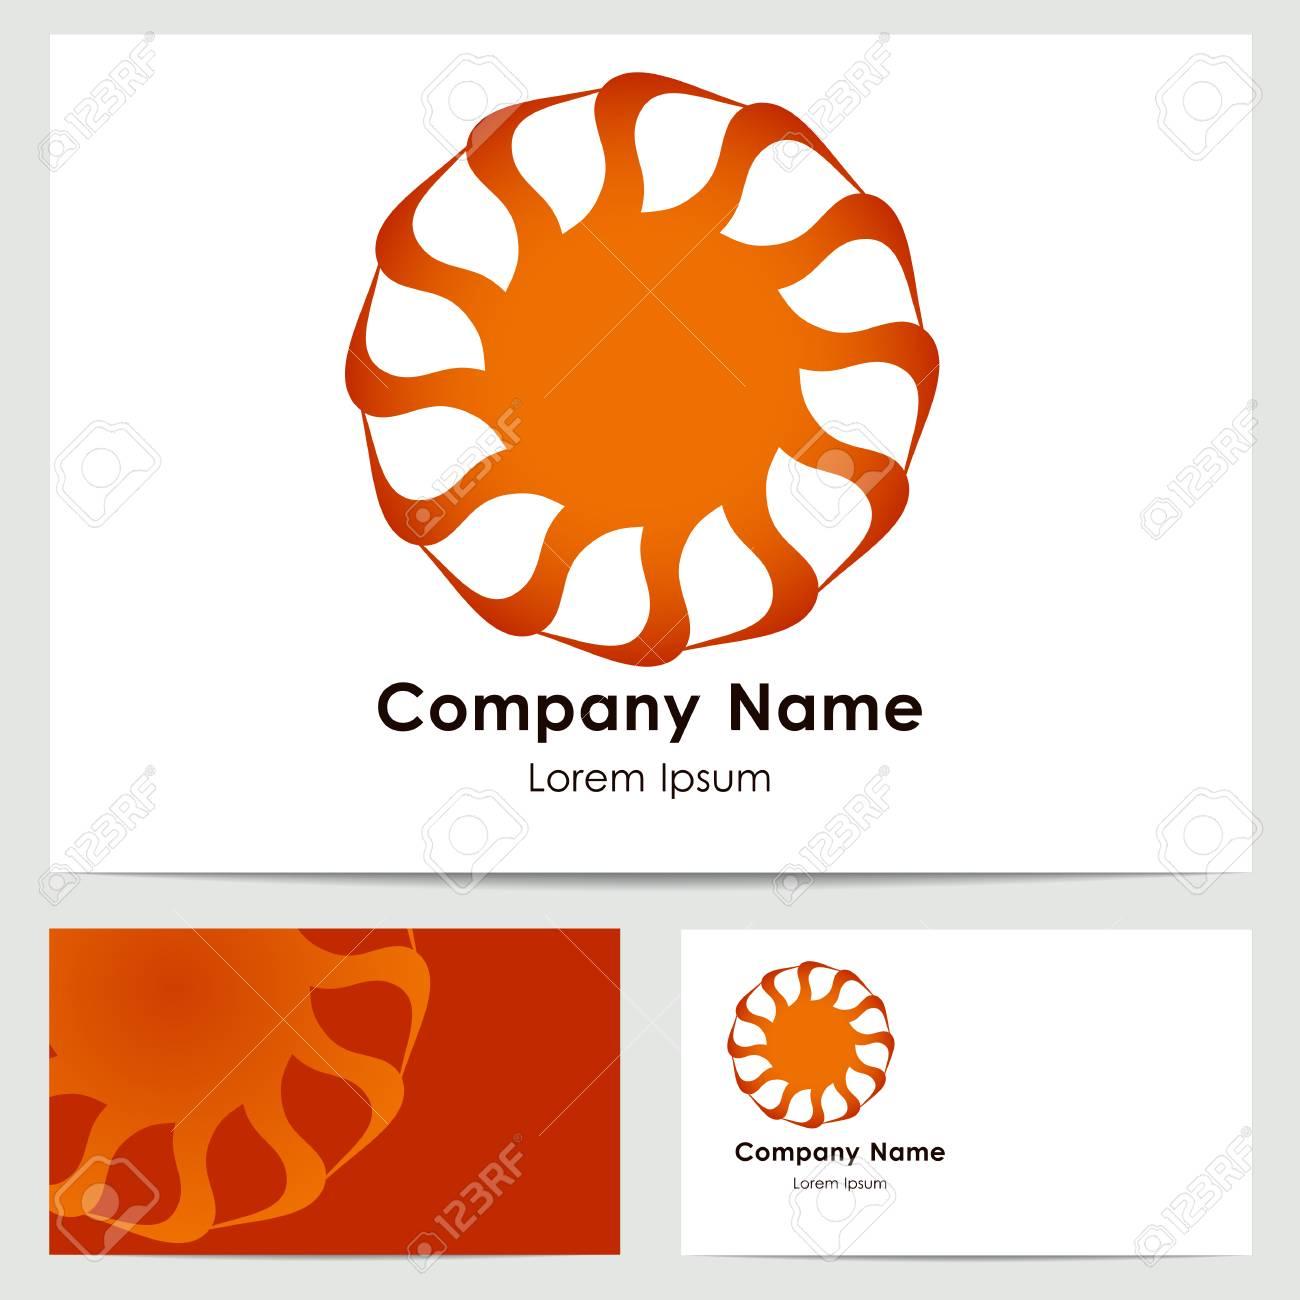 Business card template abstract logo sun royalty free cliparts business card template abstract logo sun stock vector 48899758 reheart Image collections